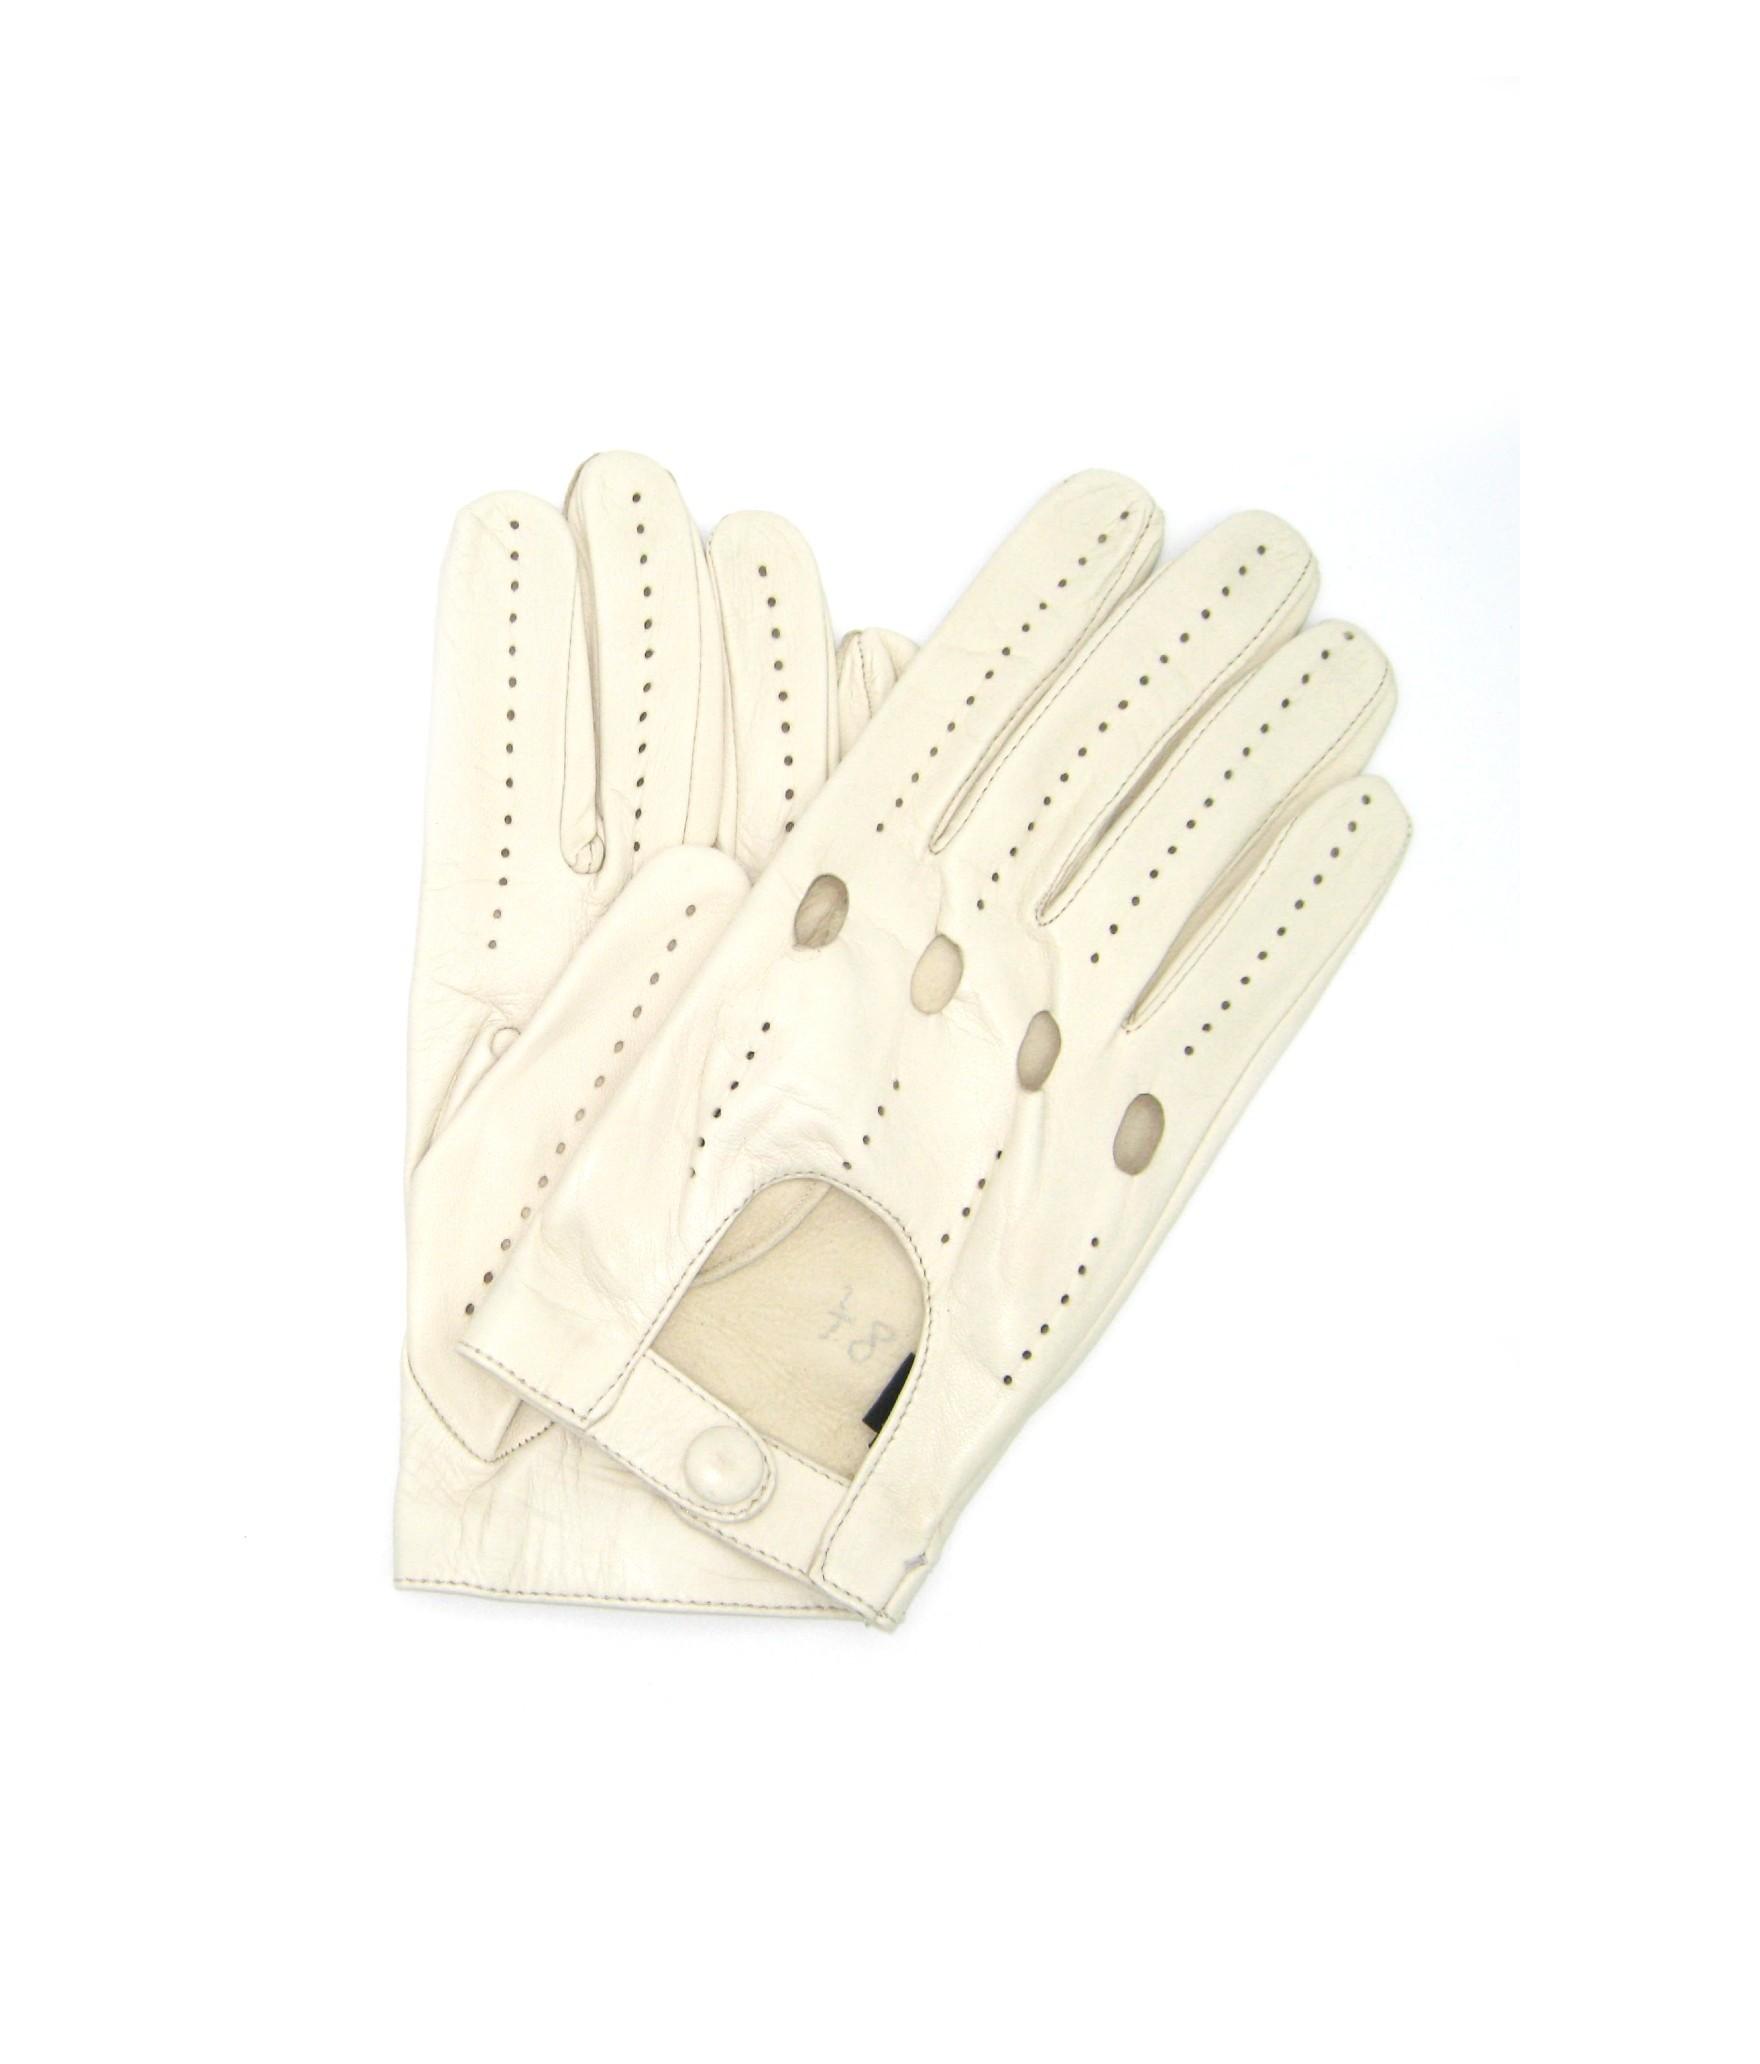 Driving gloves of Nappa leather Cream Sermoneta Gloves Leather